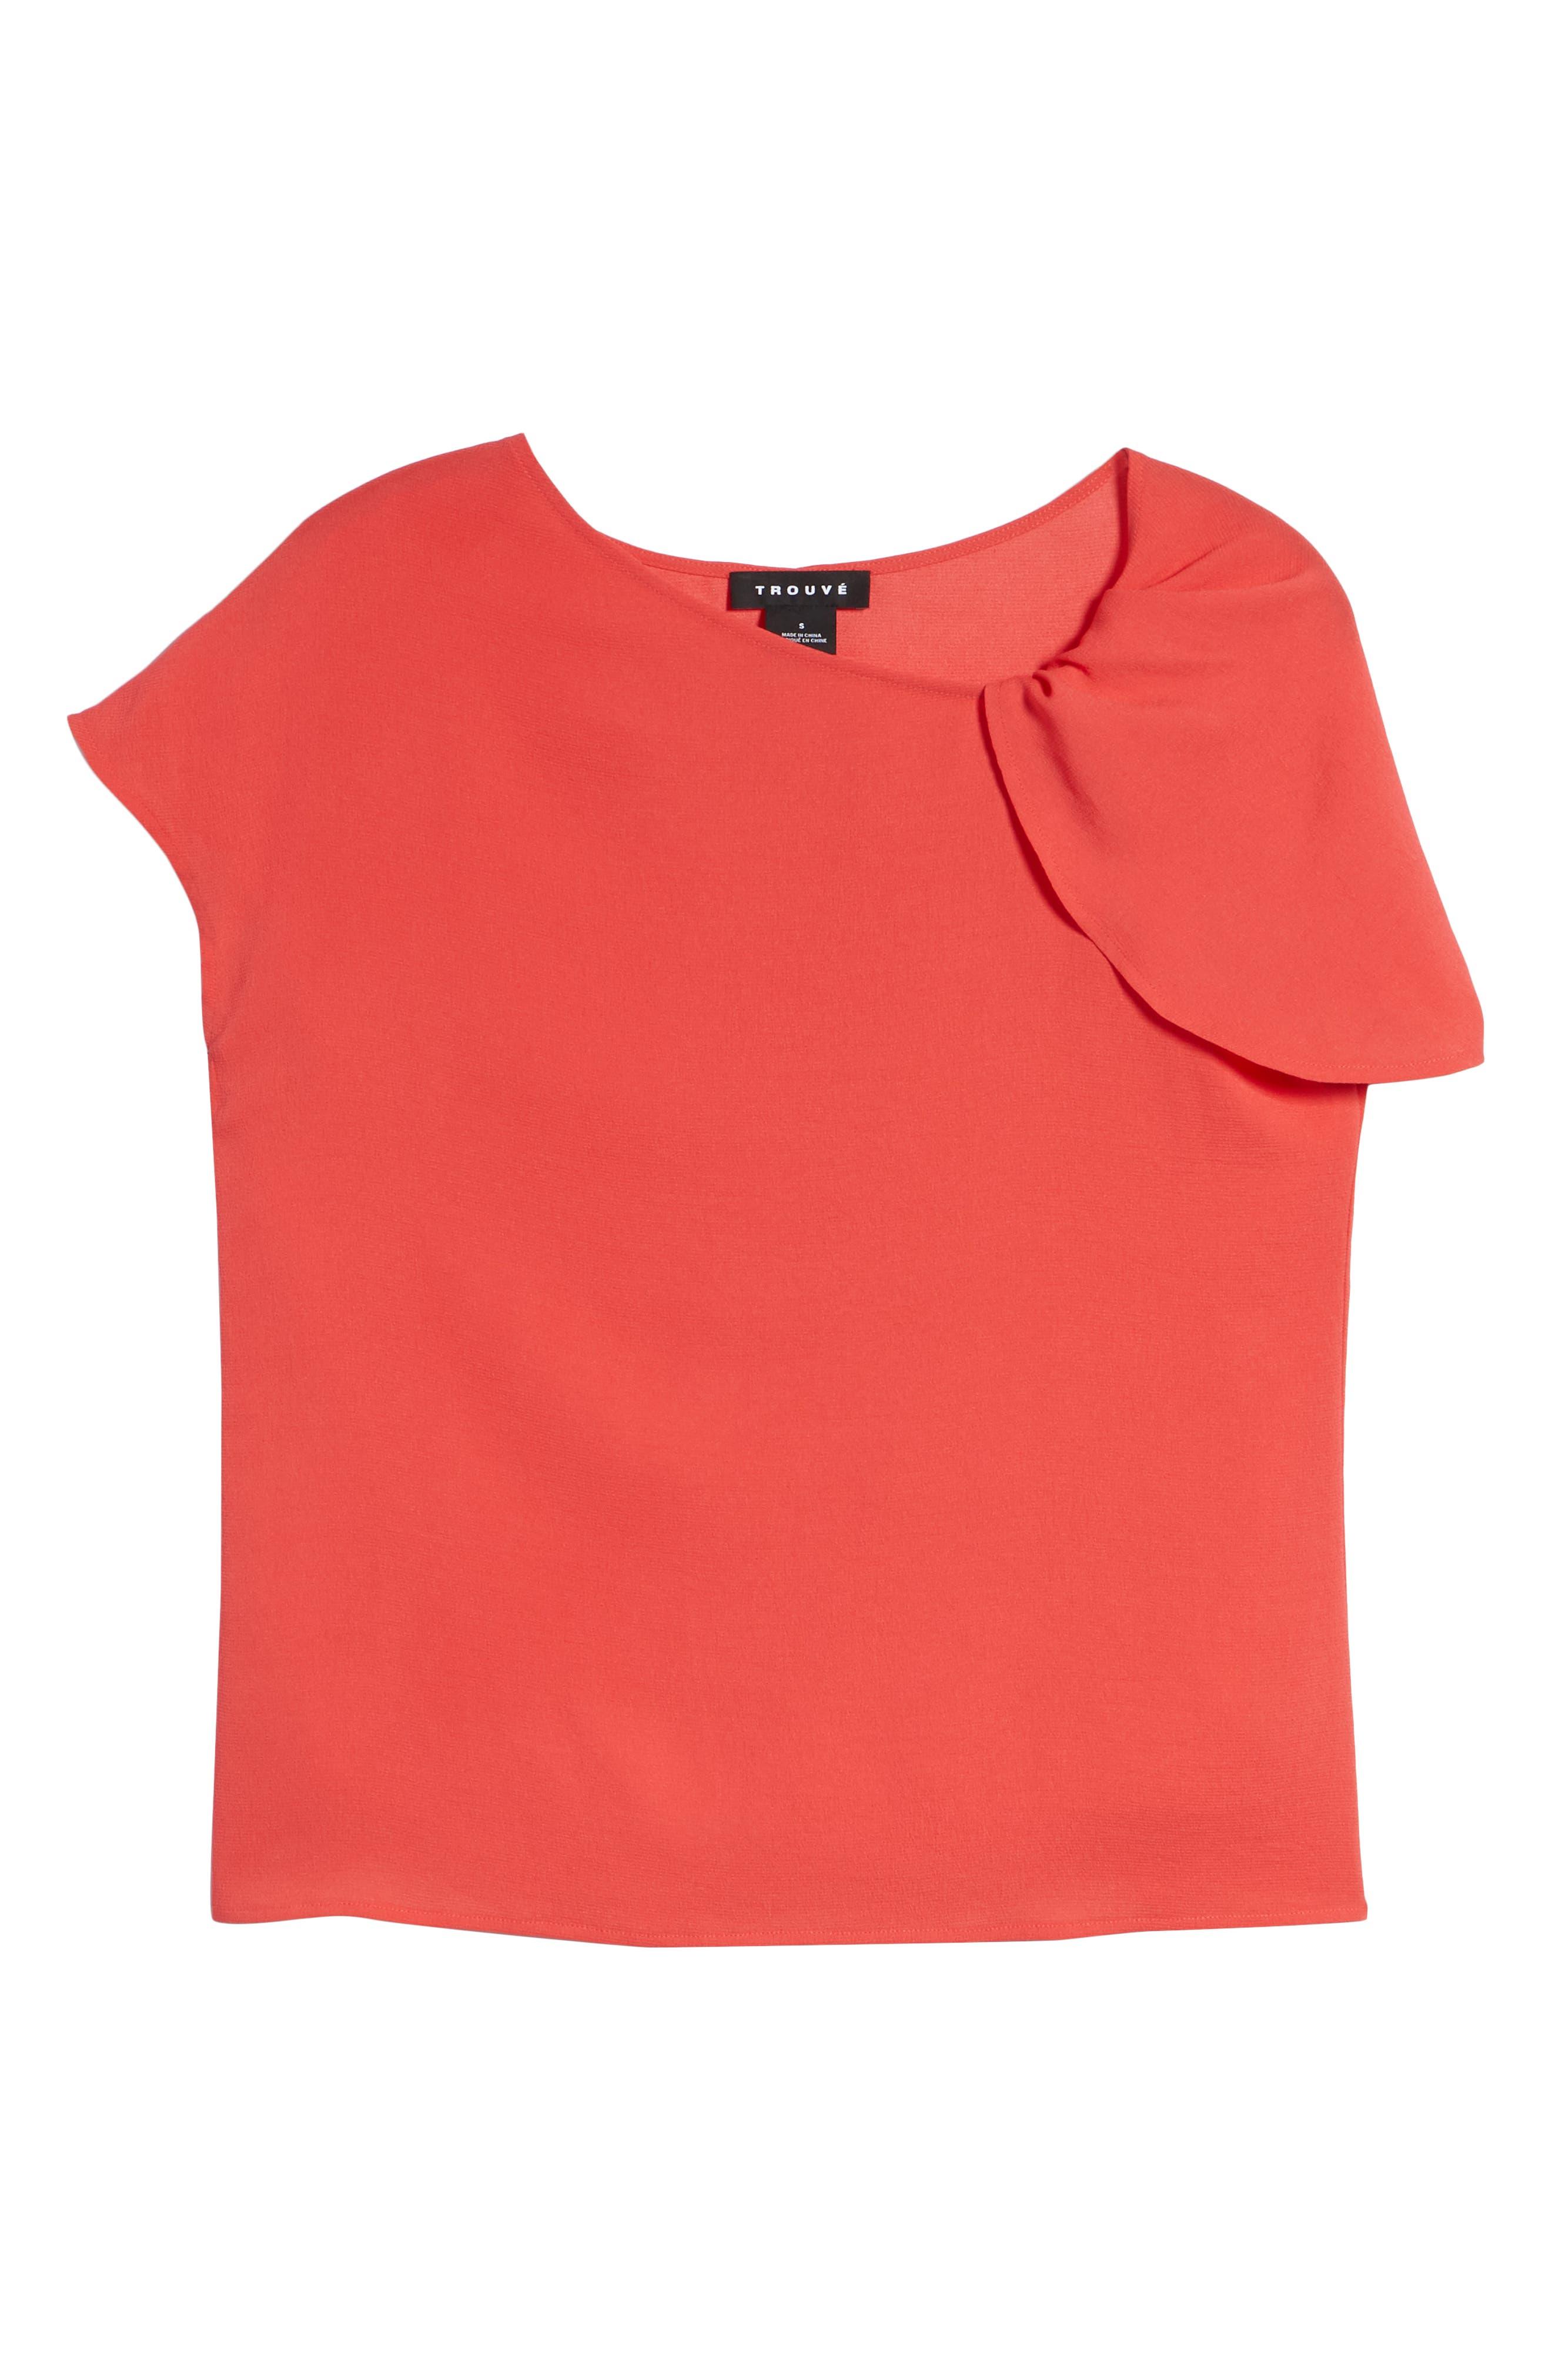 Asymmetrical Shoulder Top,                             Alternate thumbnail 7, color,                             Red Hibiscus